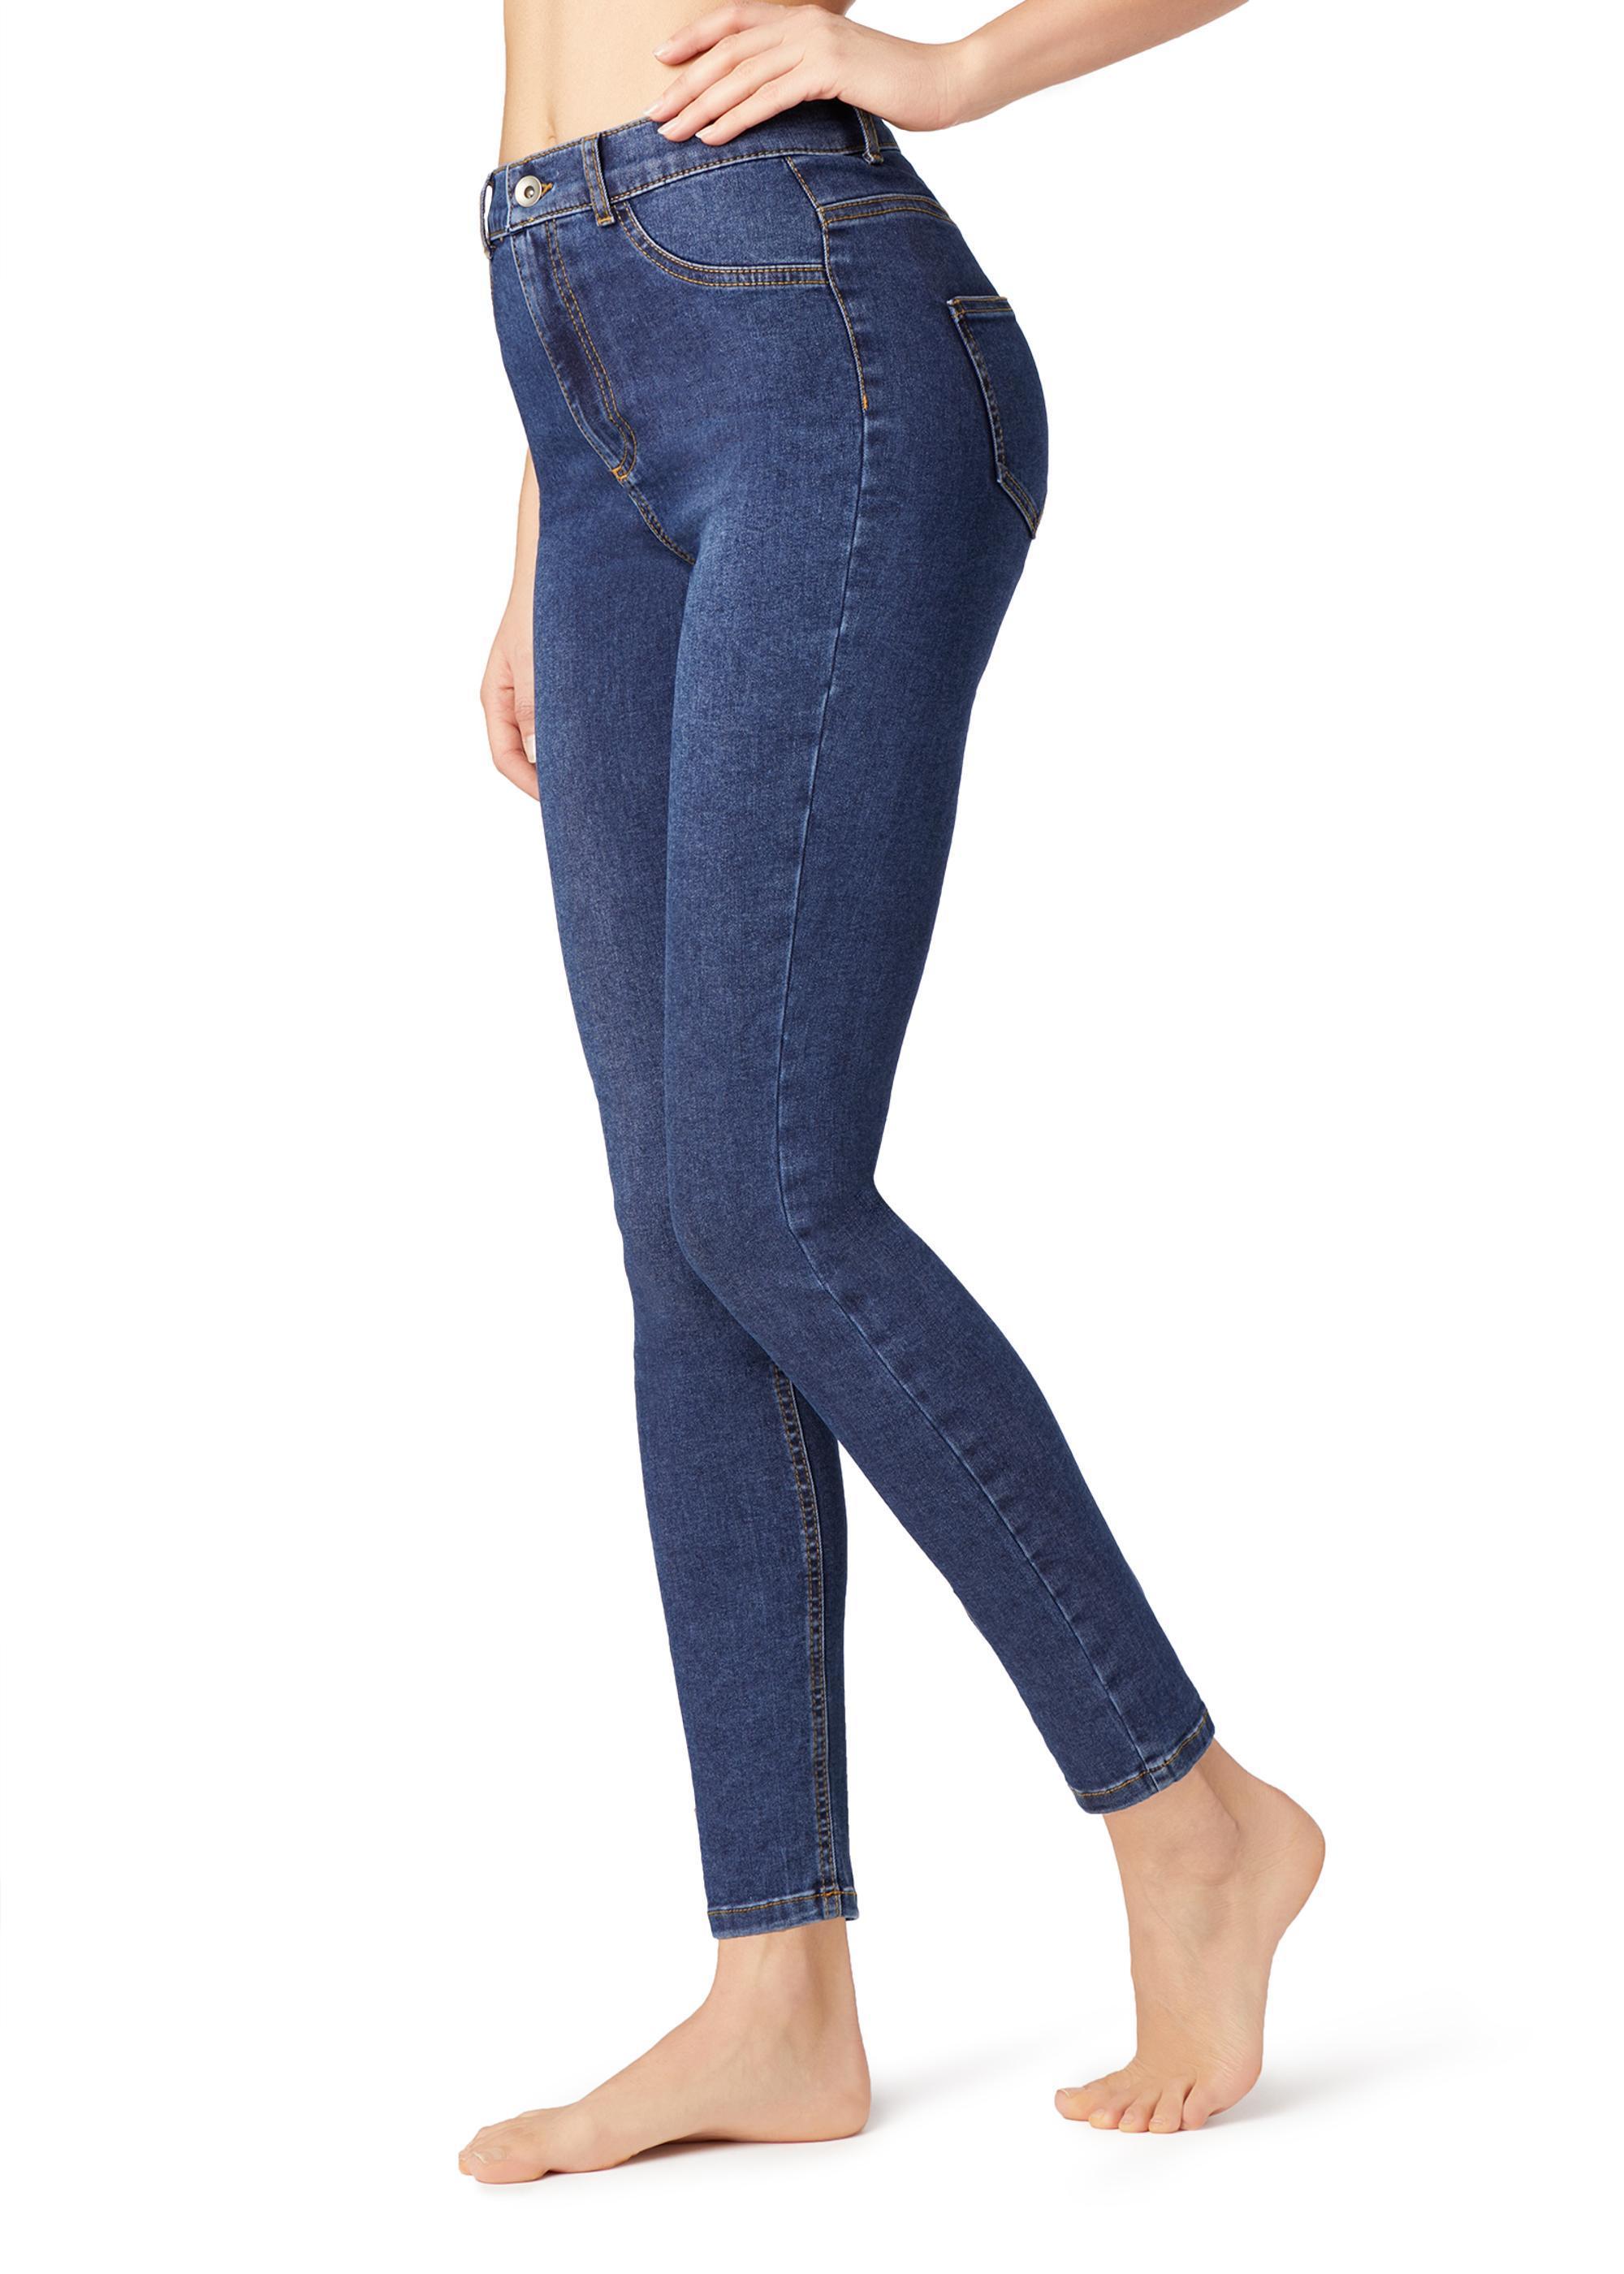 cc796903d5371 Super Push-Up Jeans - Calzedonia